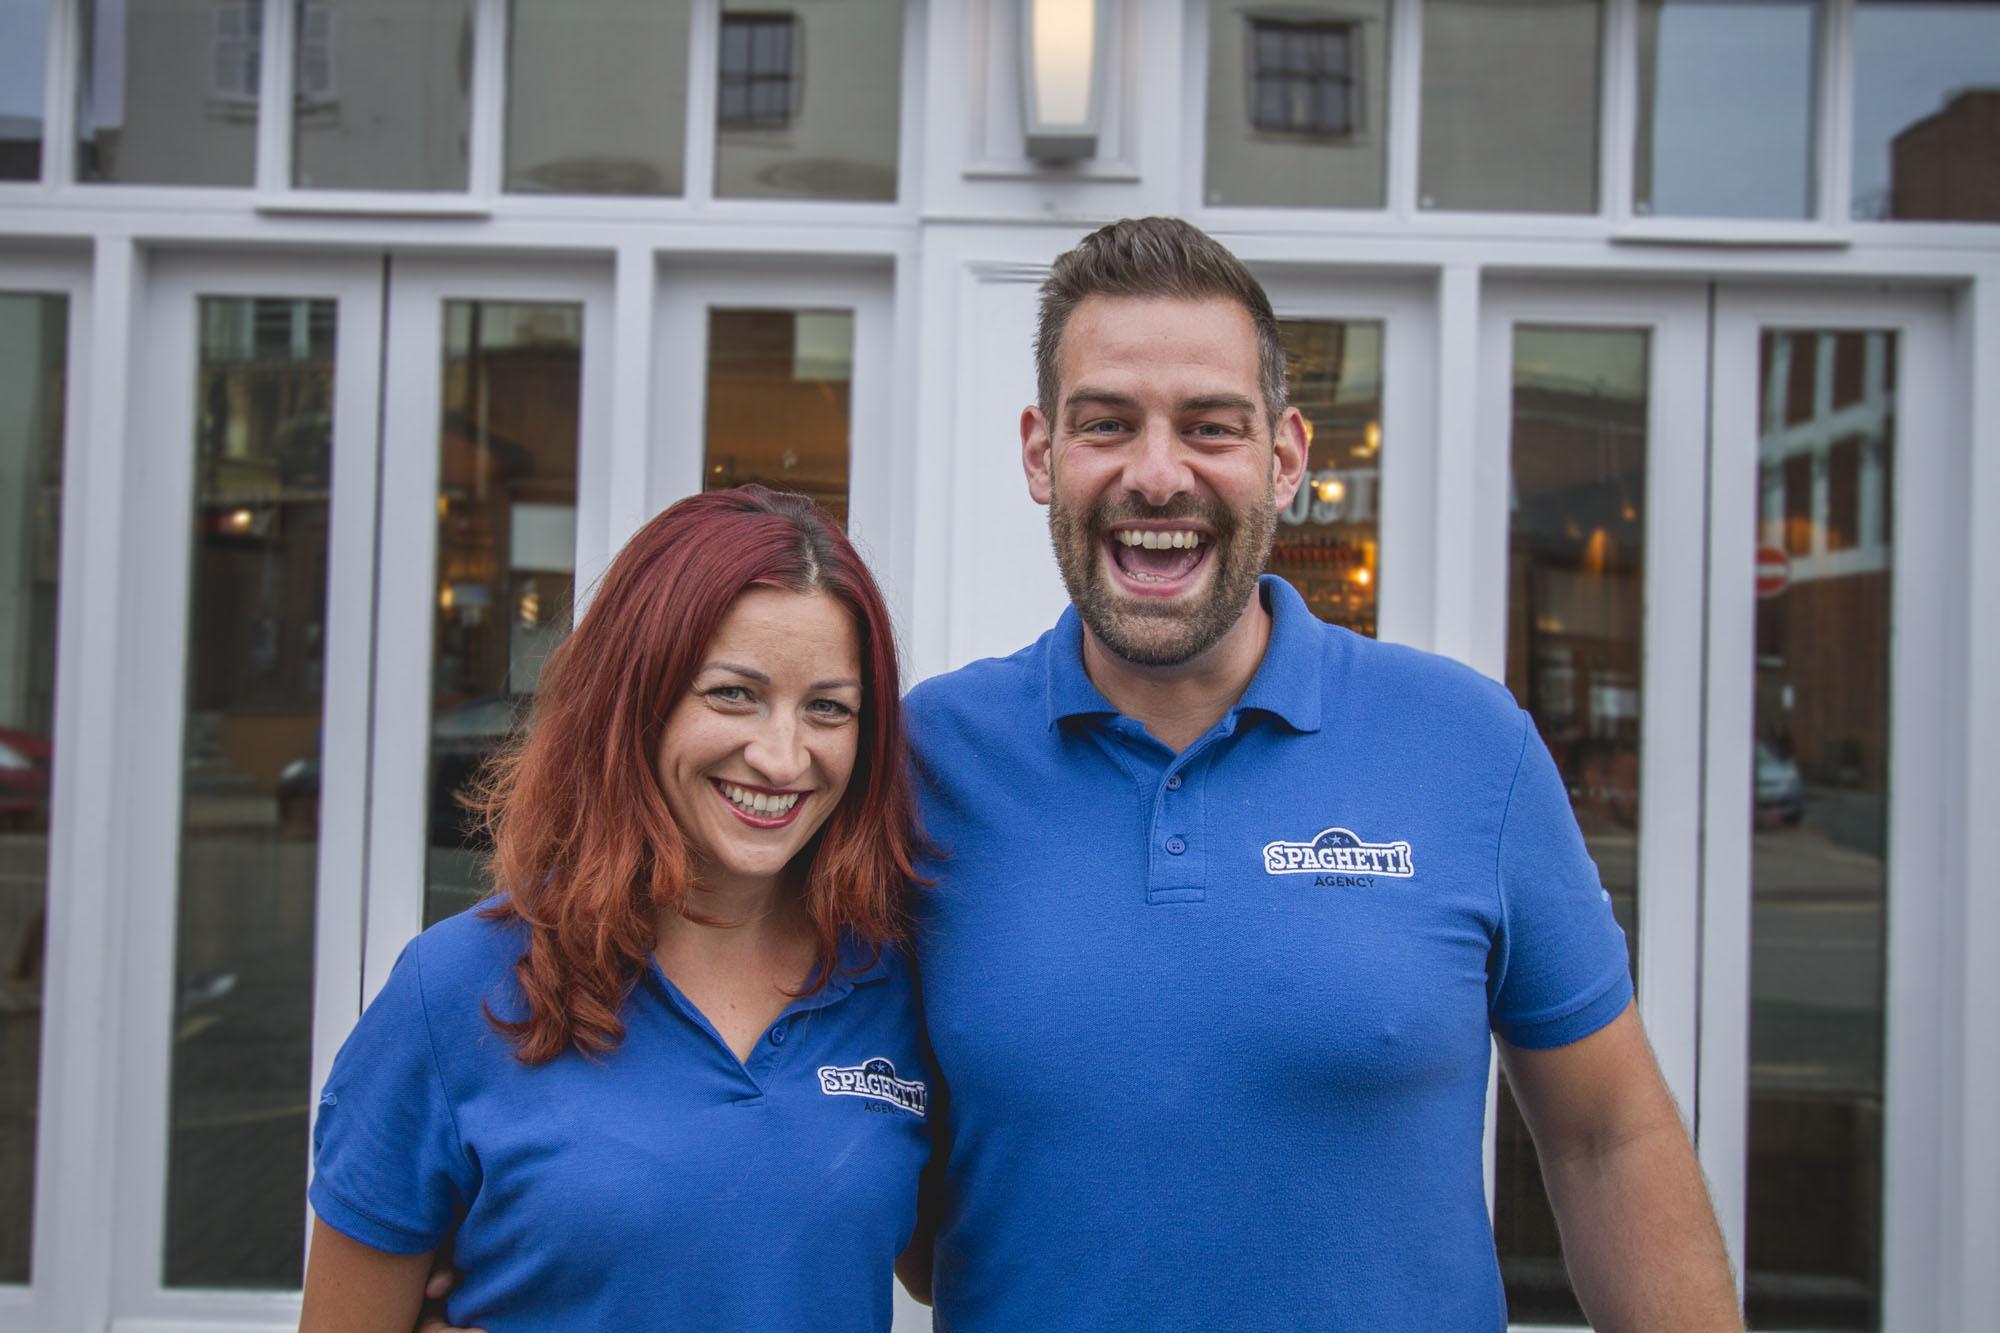 Todd and Jo, Spaghetti Agency in Warwick